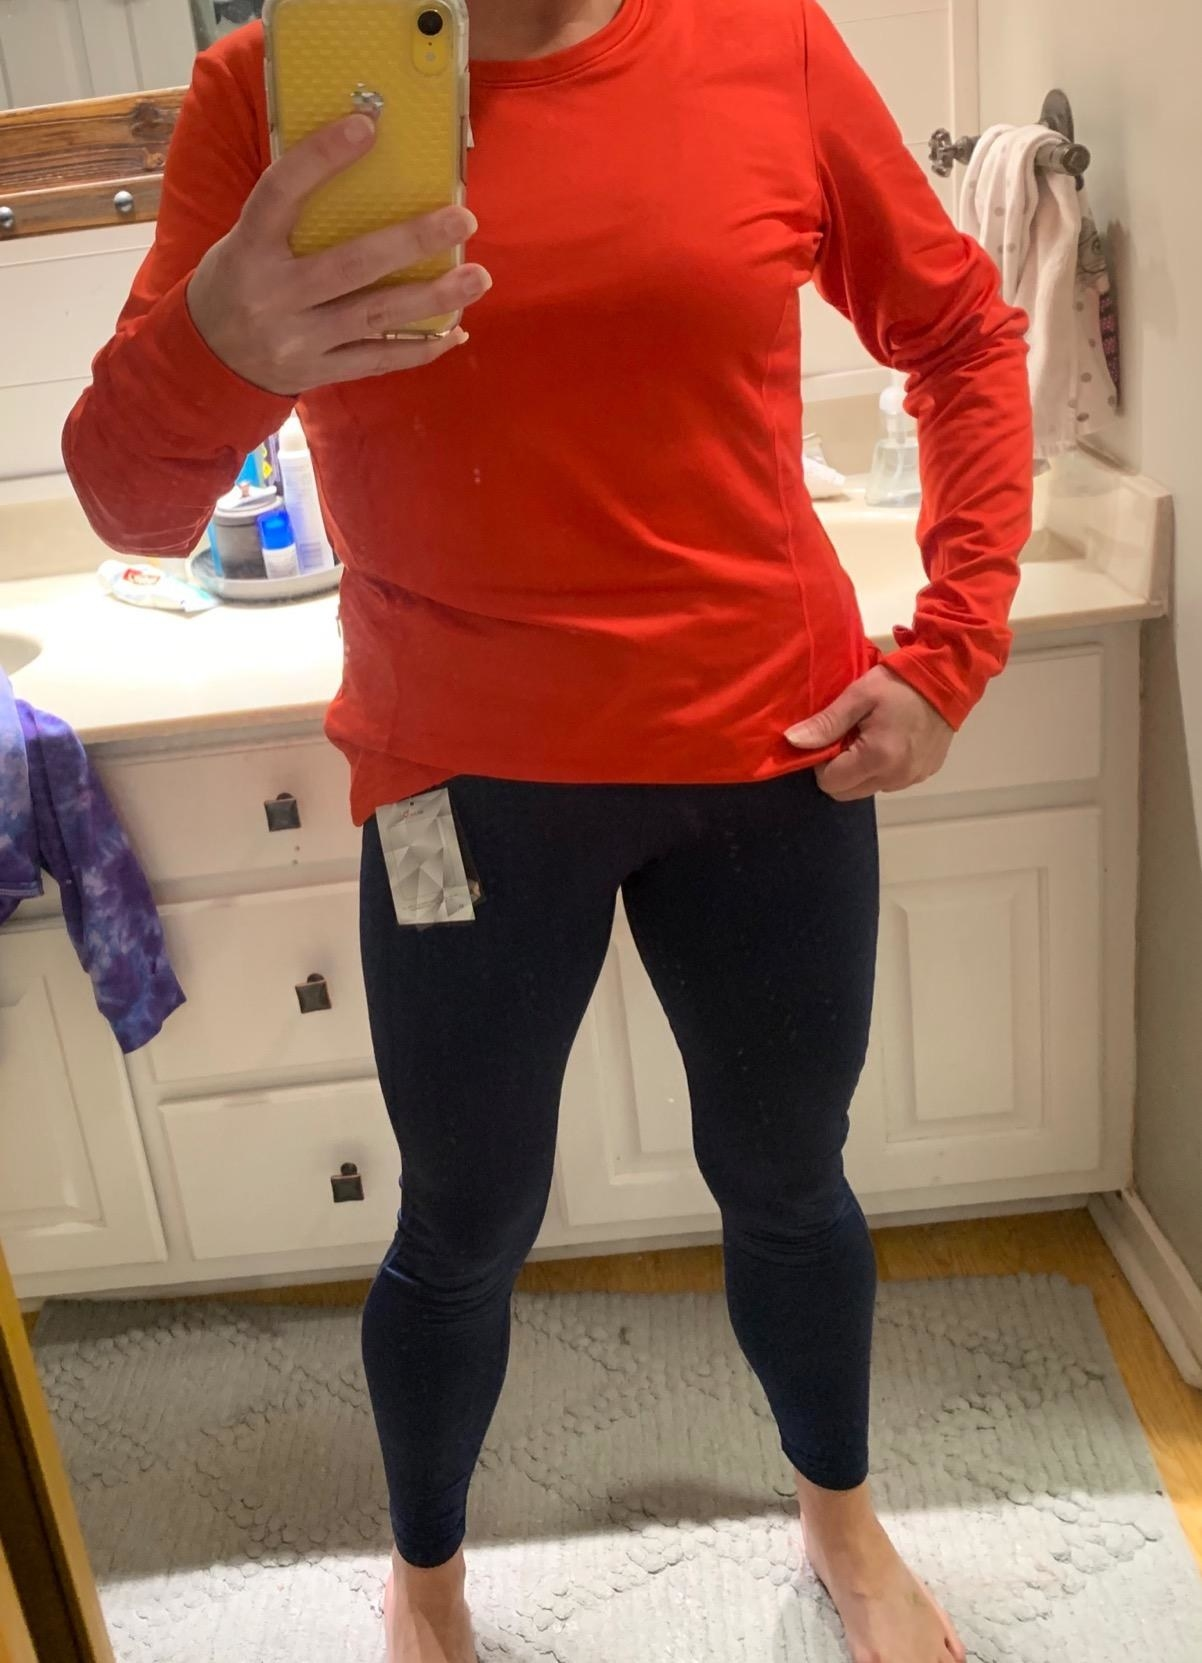 reviewer selfie of them wearing the fleece-lined leggings